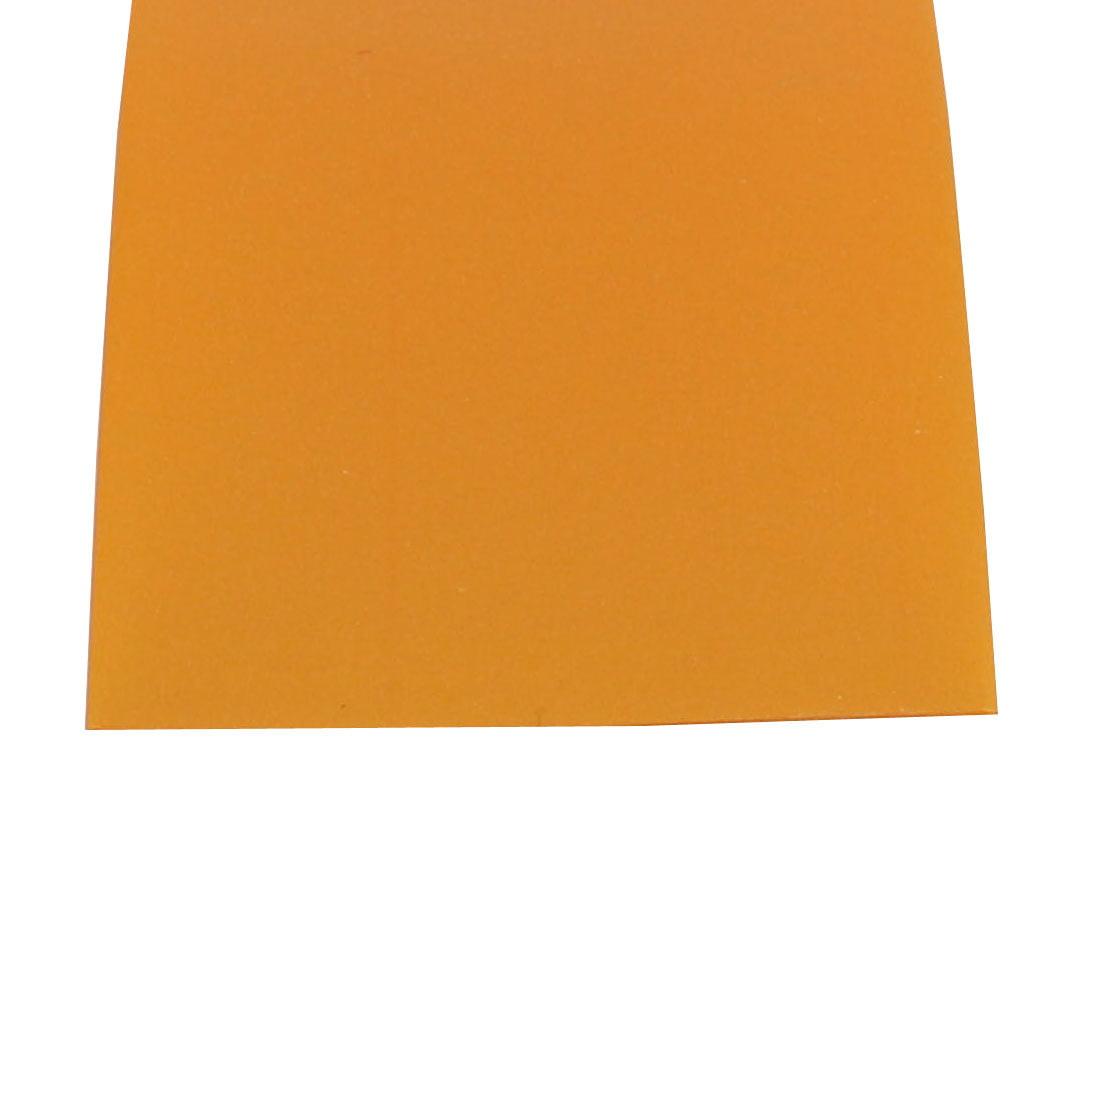 Unique Bargains 10pcs 29.5mm Flat Width 72mm Long Heat Shrinkable Tube Gold Tone f 18650 Battery - image 1 of 2